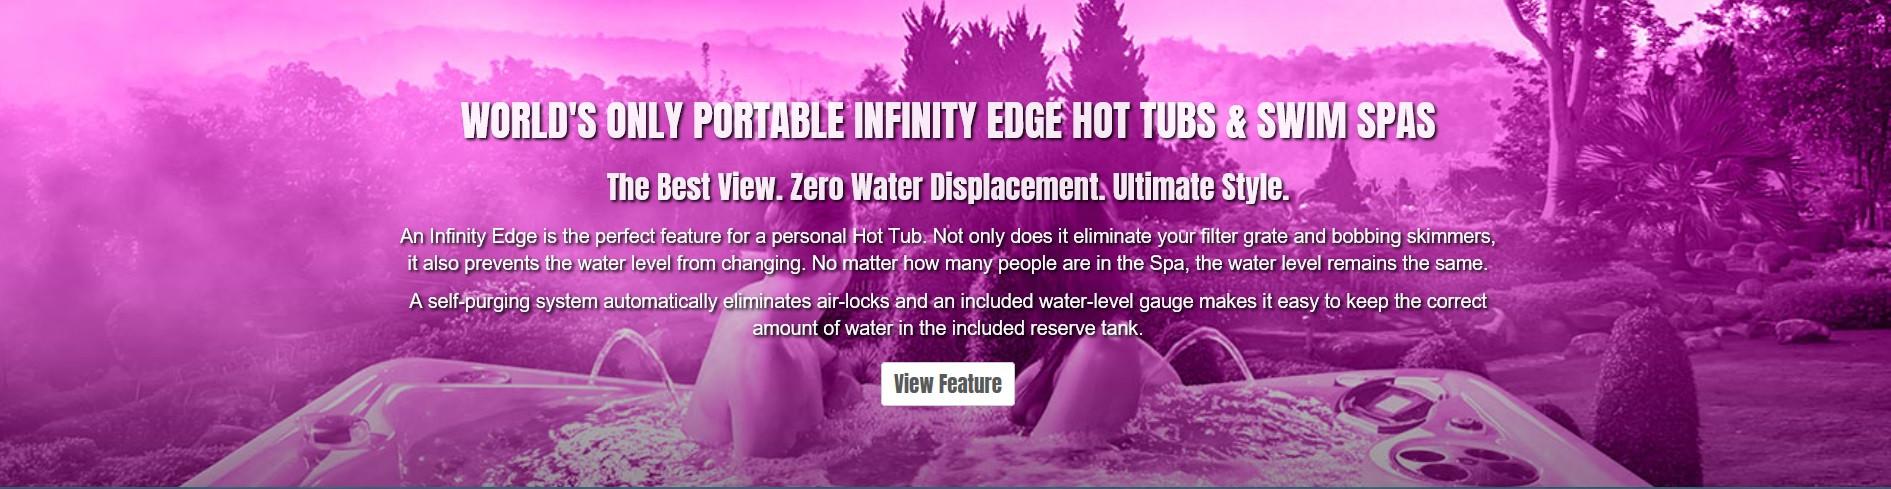 infinity edge.jpg